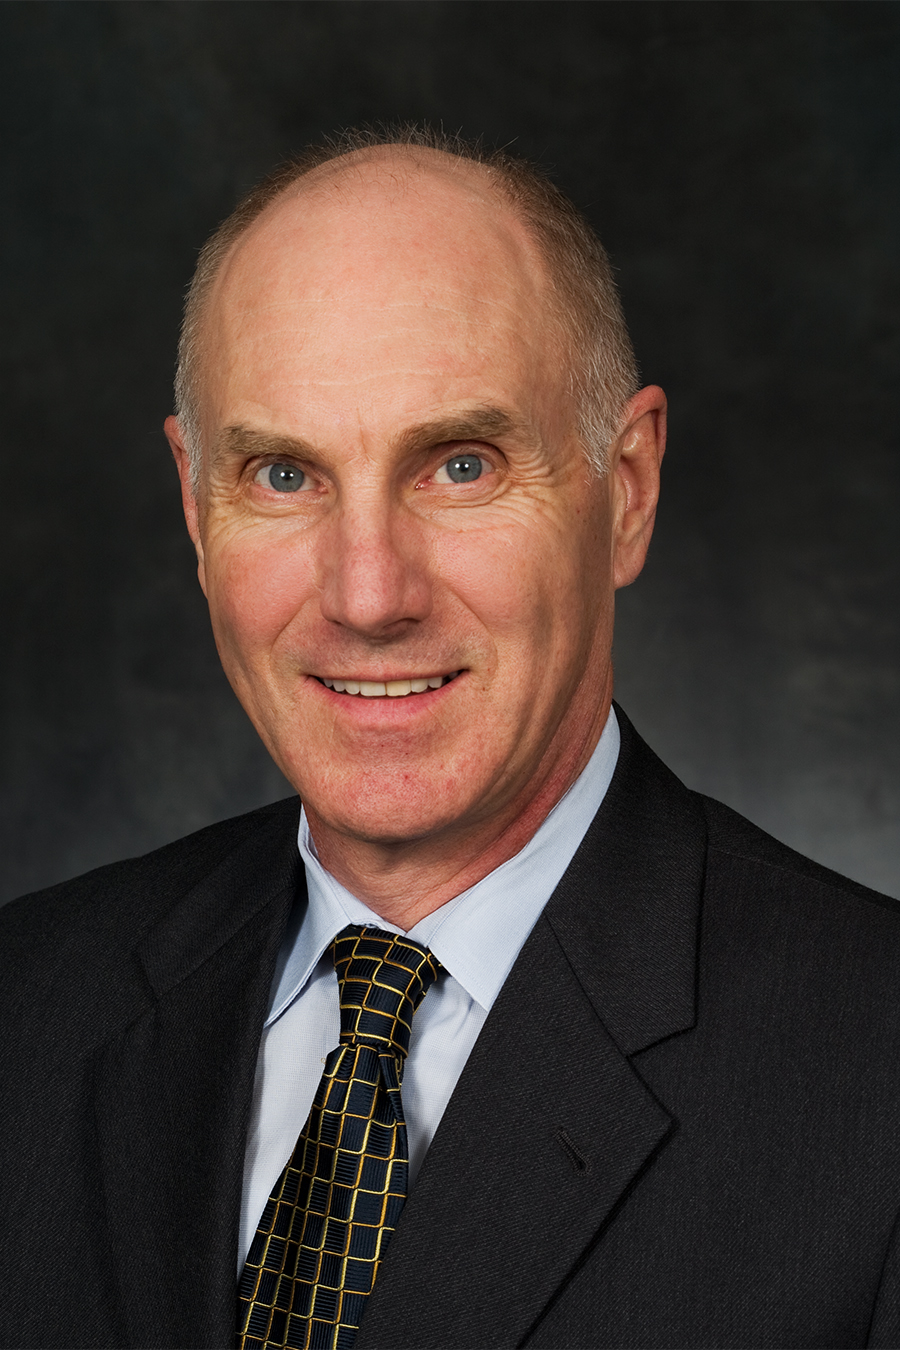 John G. Stoner, M.D.